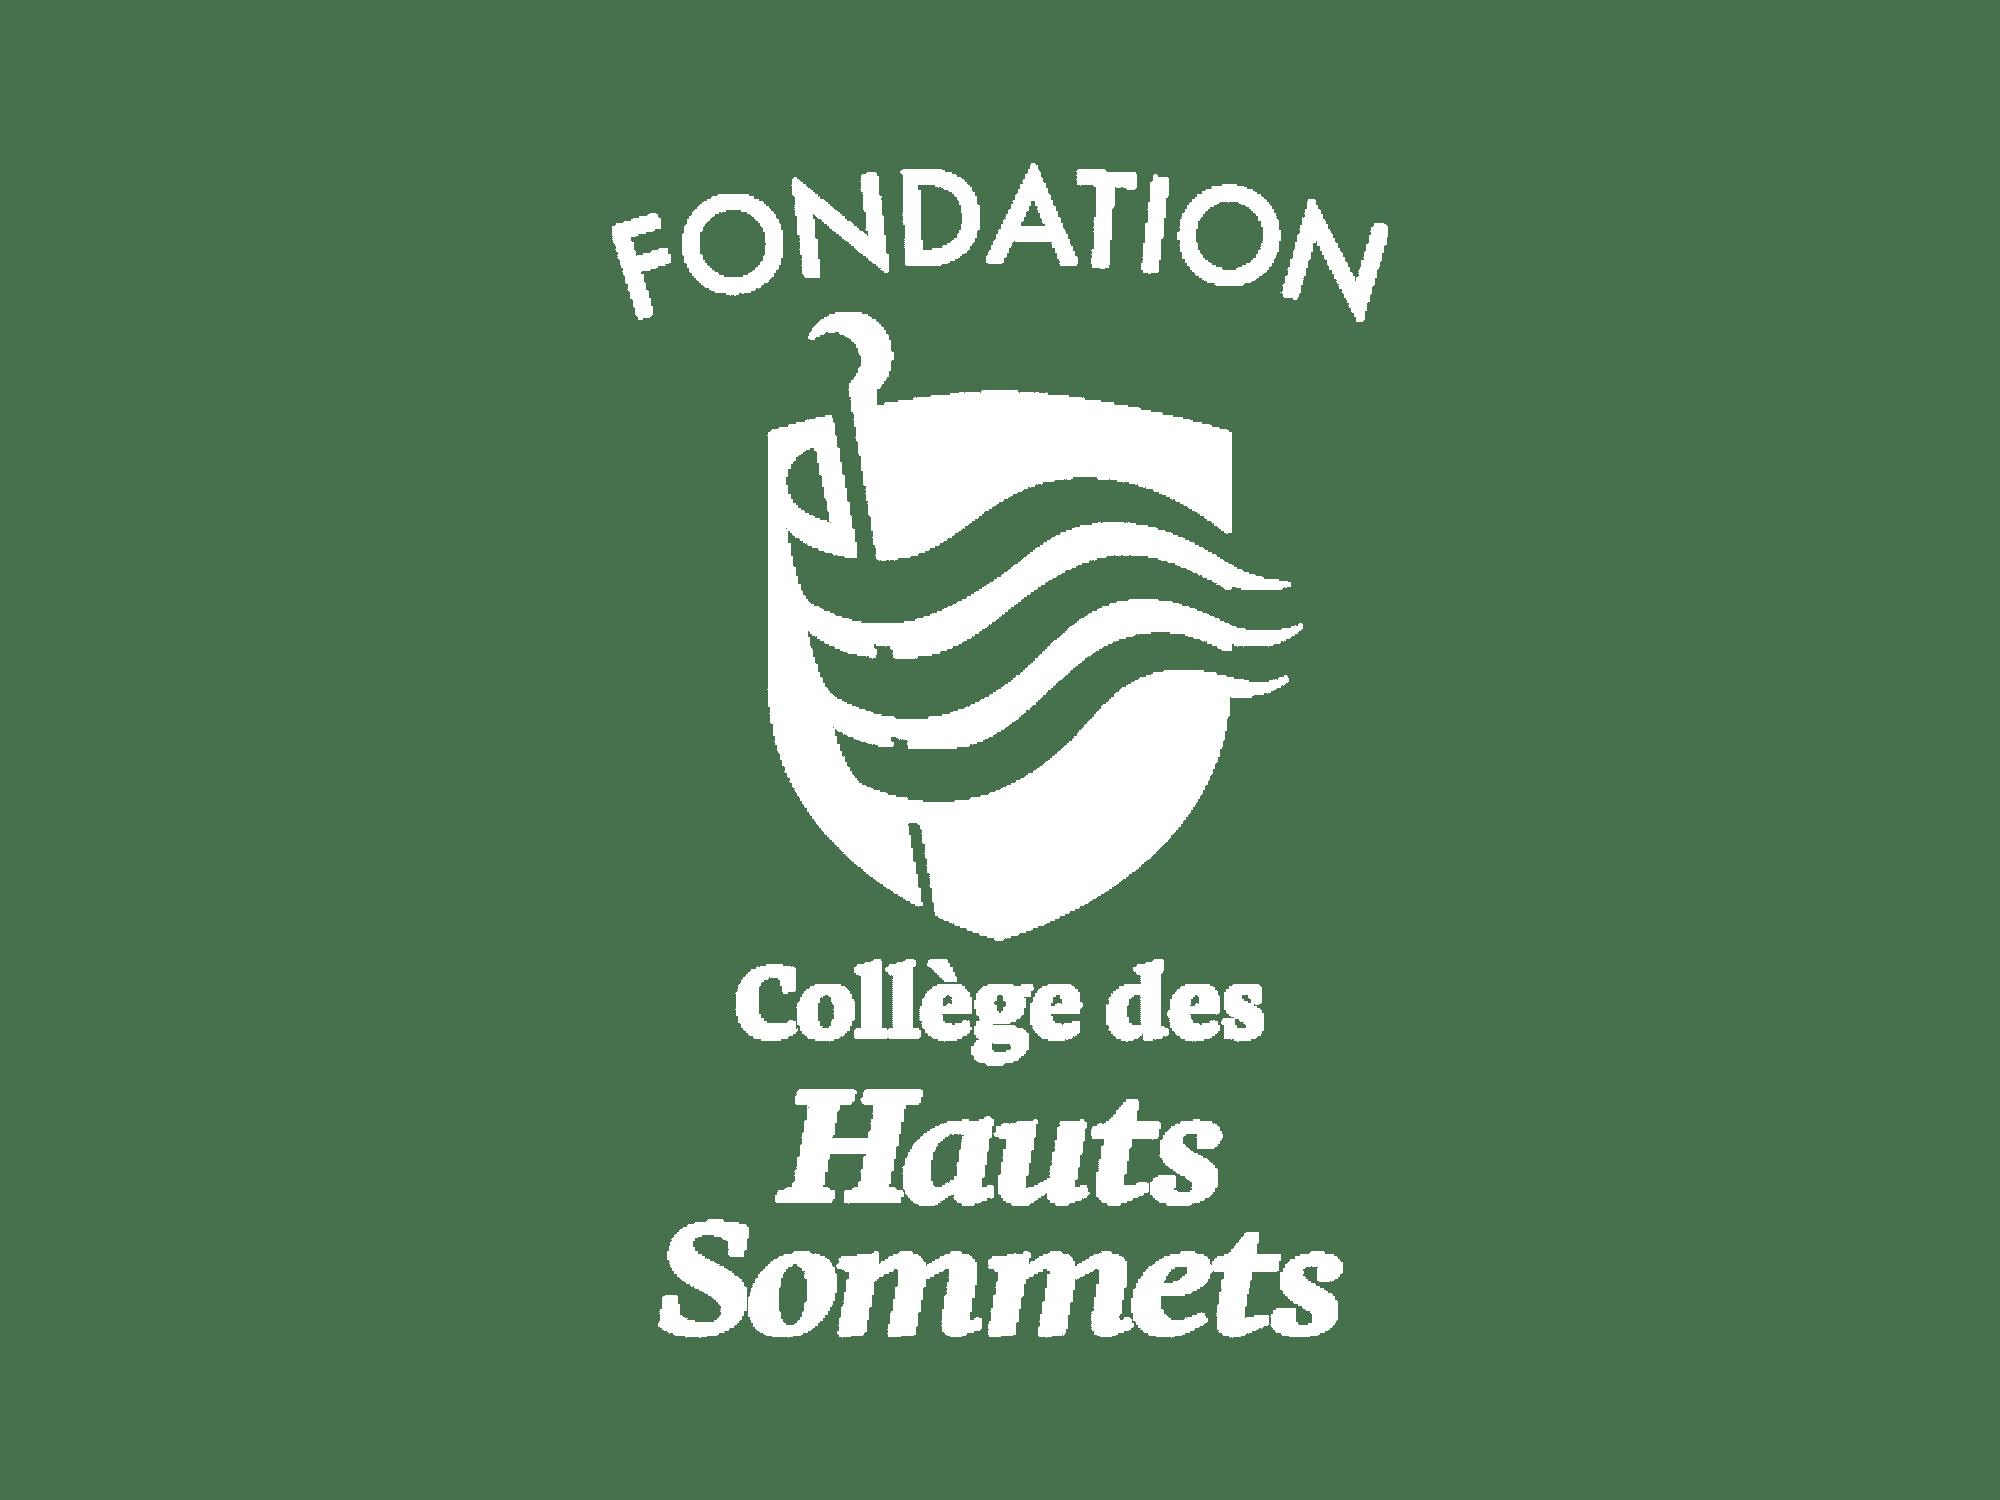 Fondation2.png